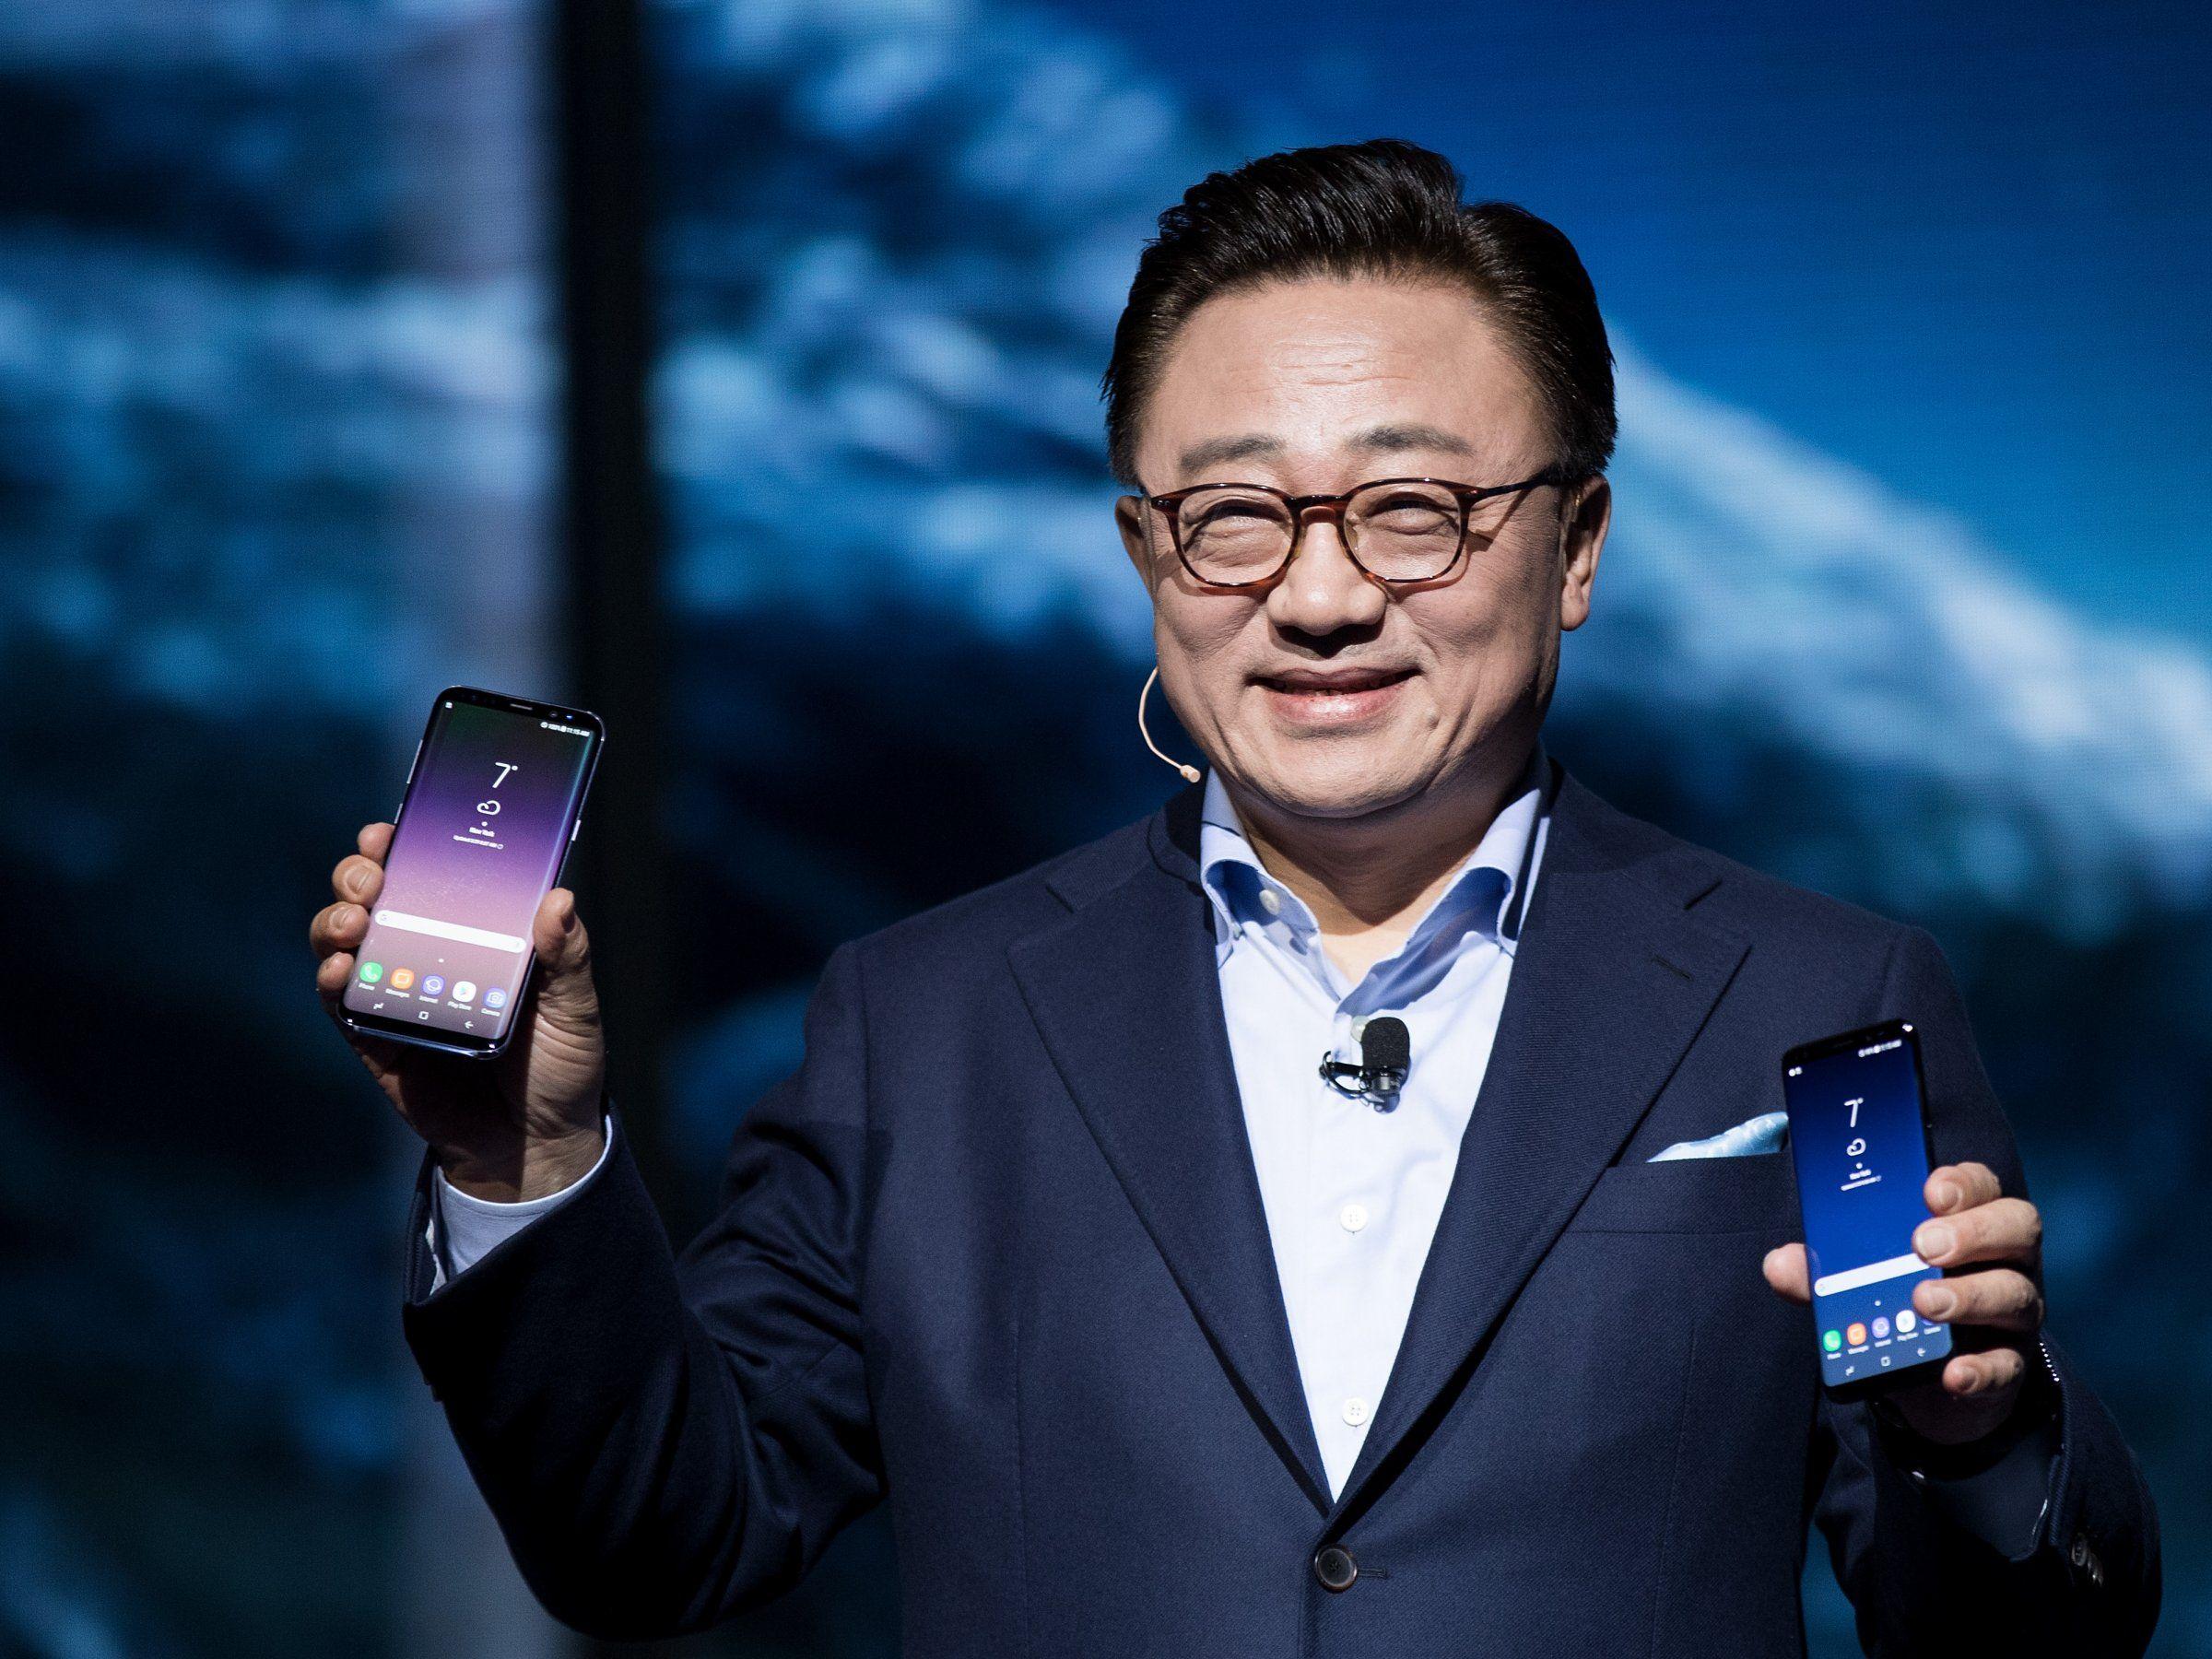 Samsung blasted past estimates with a record £9 billion